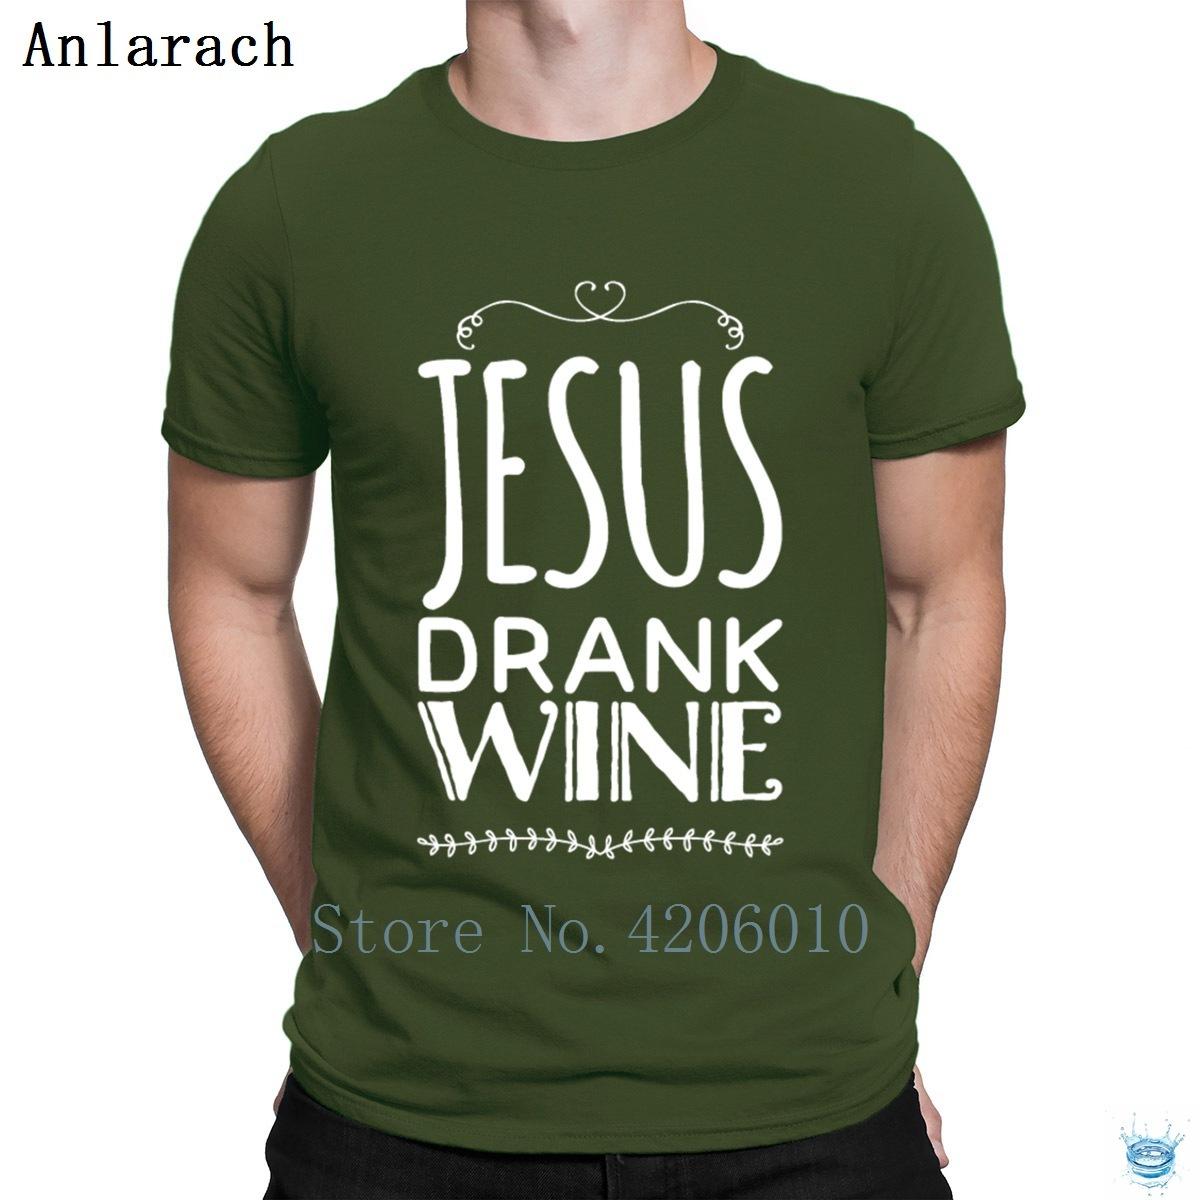 Jesus Drank Wine T-Shirts Great Summer Style Formal Male Men's Tshirt Cotton Humor Gift Tee Shirt Custom